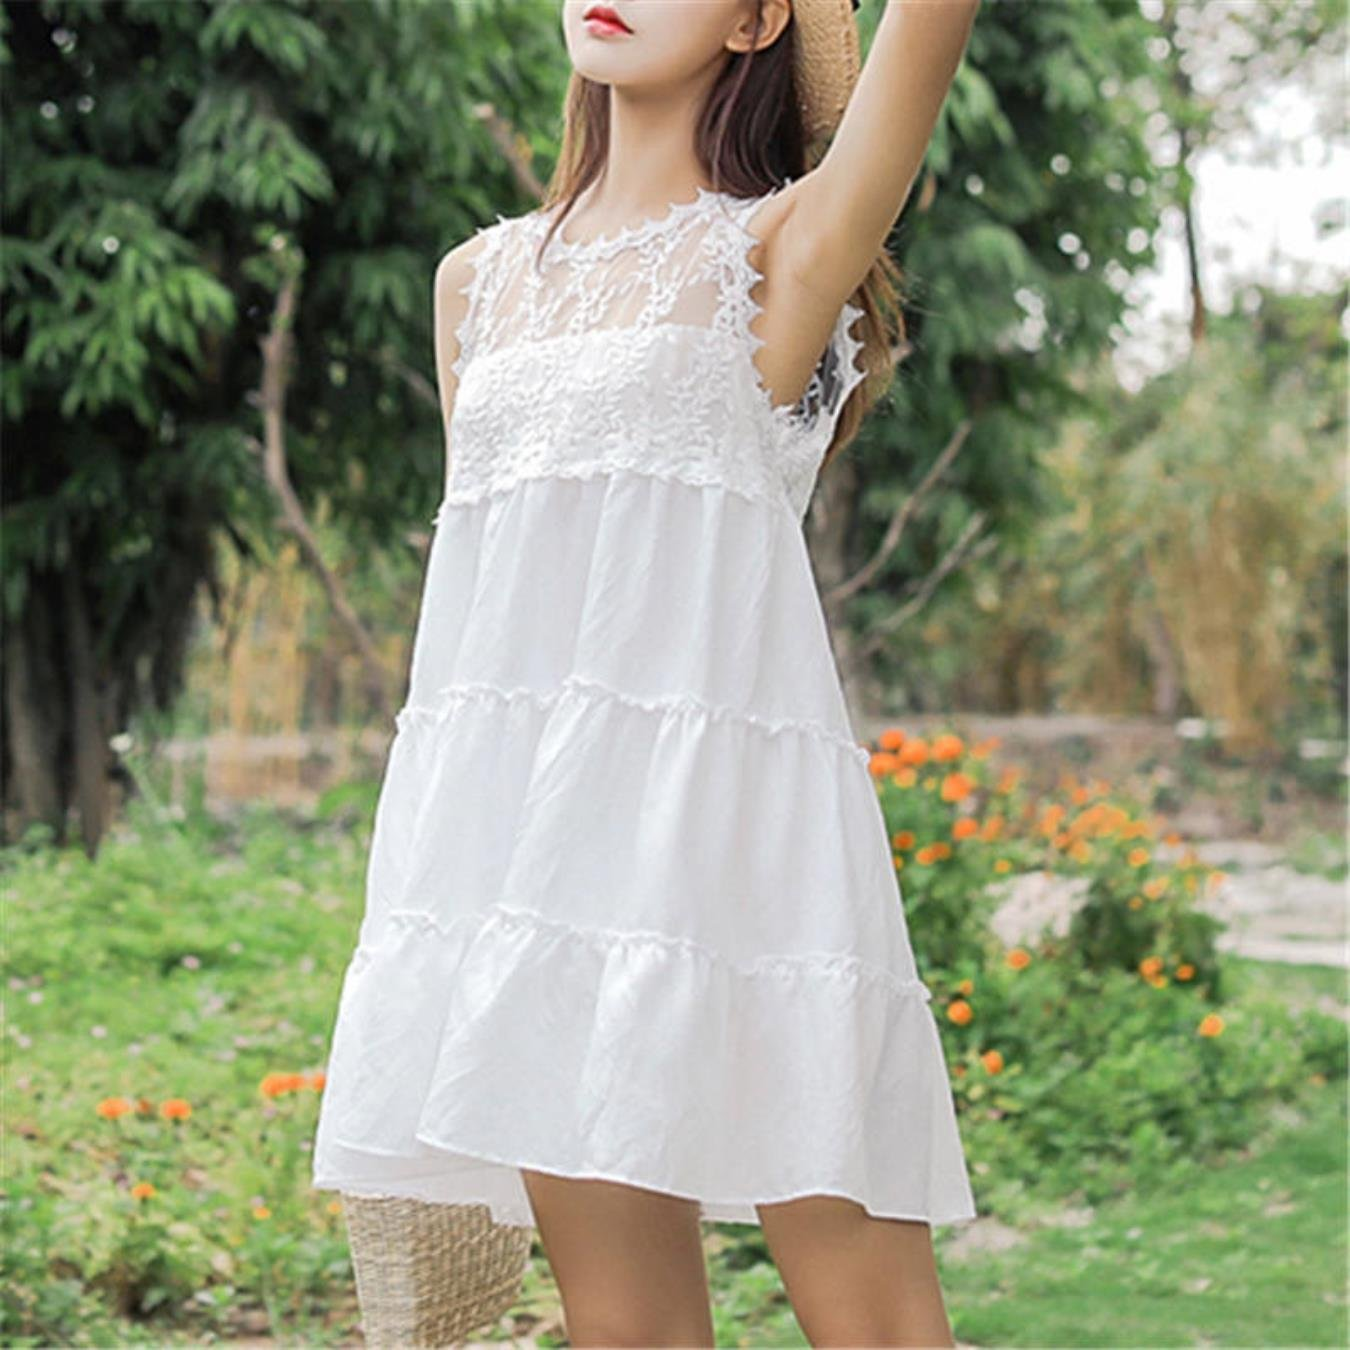 a83c01c84d2 Short Summer Beach Dresses - Gomes Weine AG